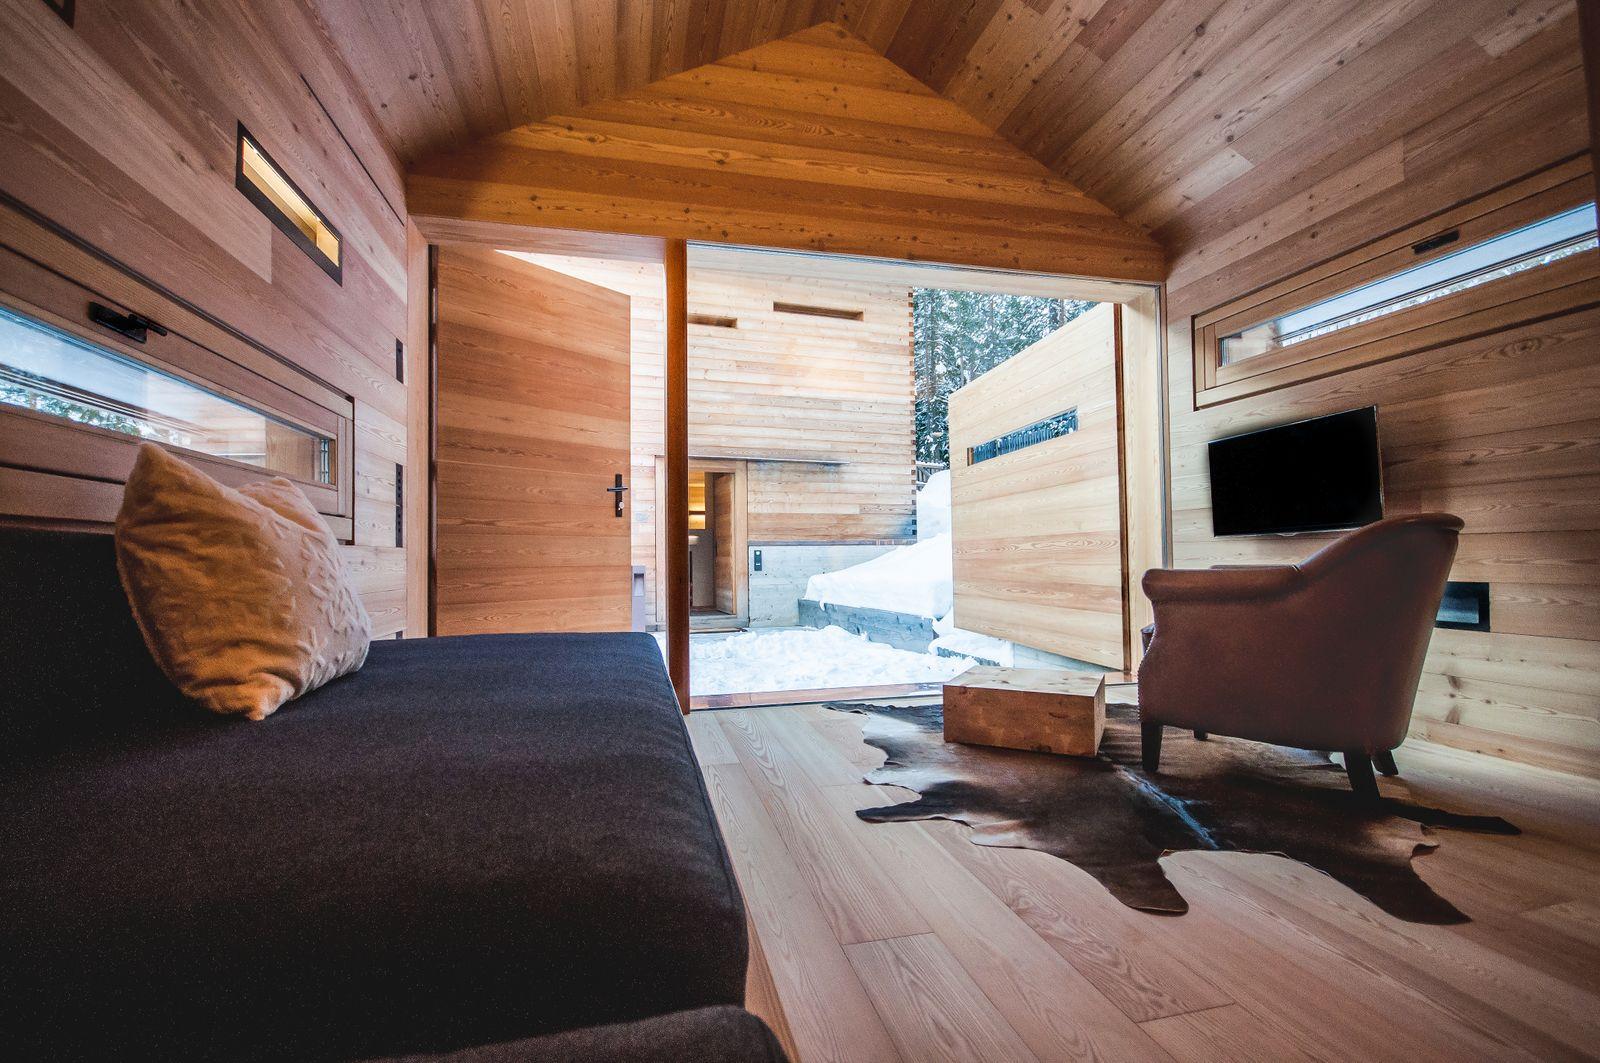 Mountain Lodge Tamersc